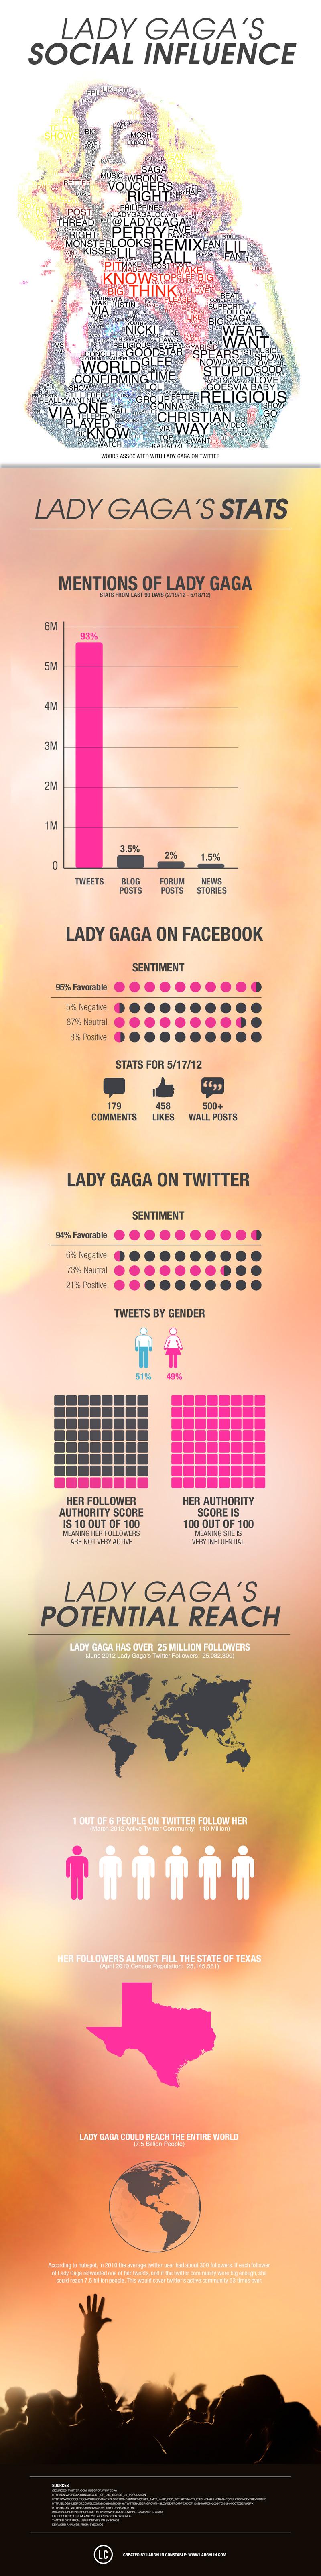 Lady Gaga's Social Influence